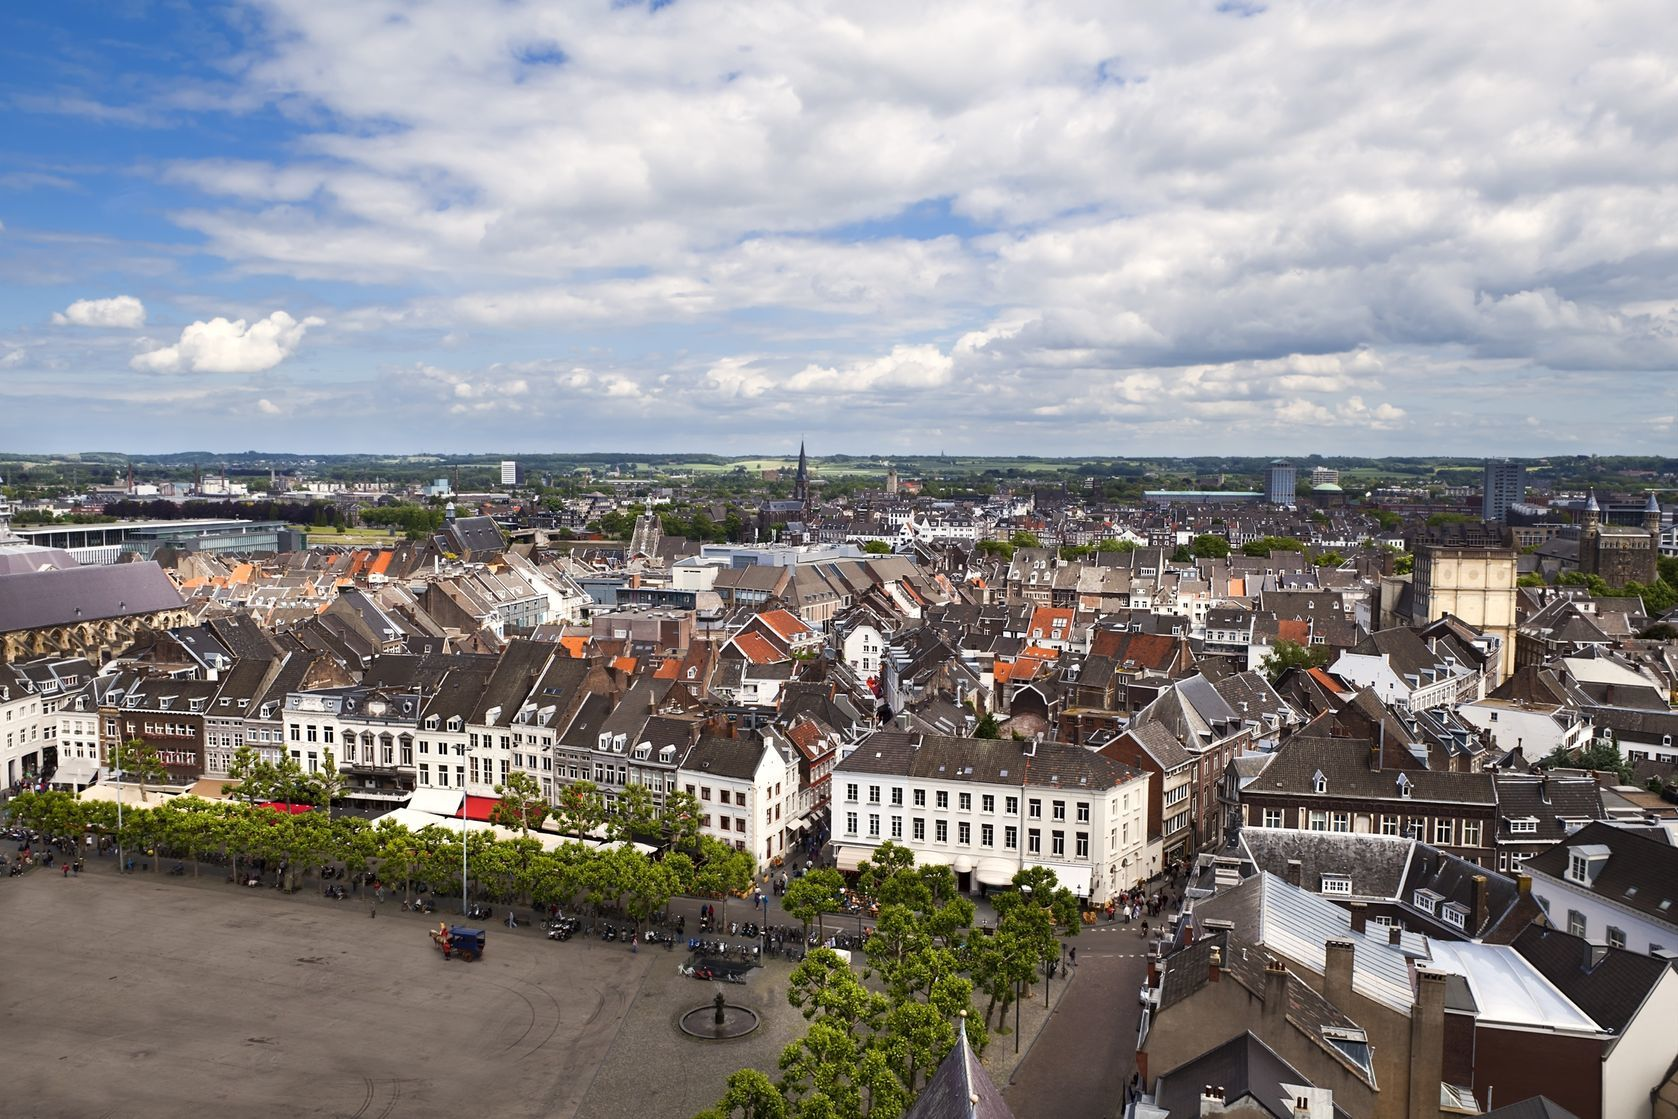 Pohled na město Maastricht   catolla/123RF.com